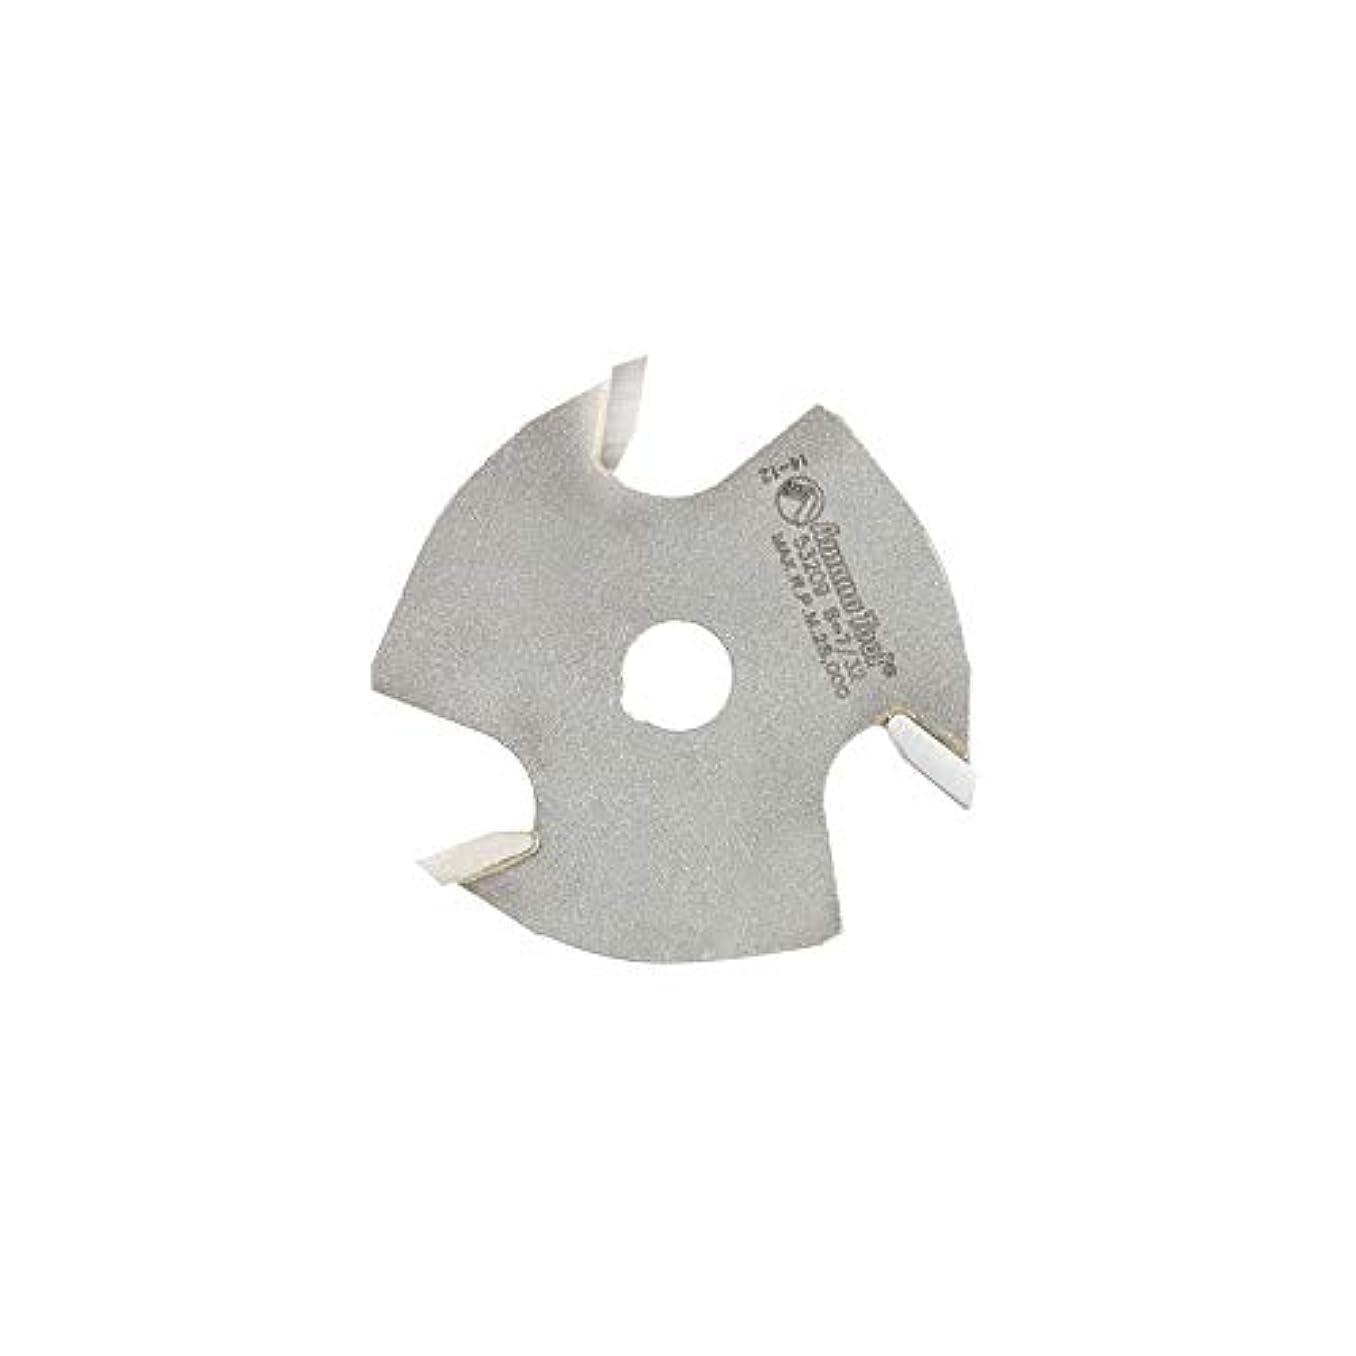 Amana Tool - 53209 Slotting Cutter 3 Wing x 1-7/8 Dia x 7/32 x 5/16 Inner Dia